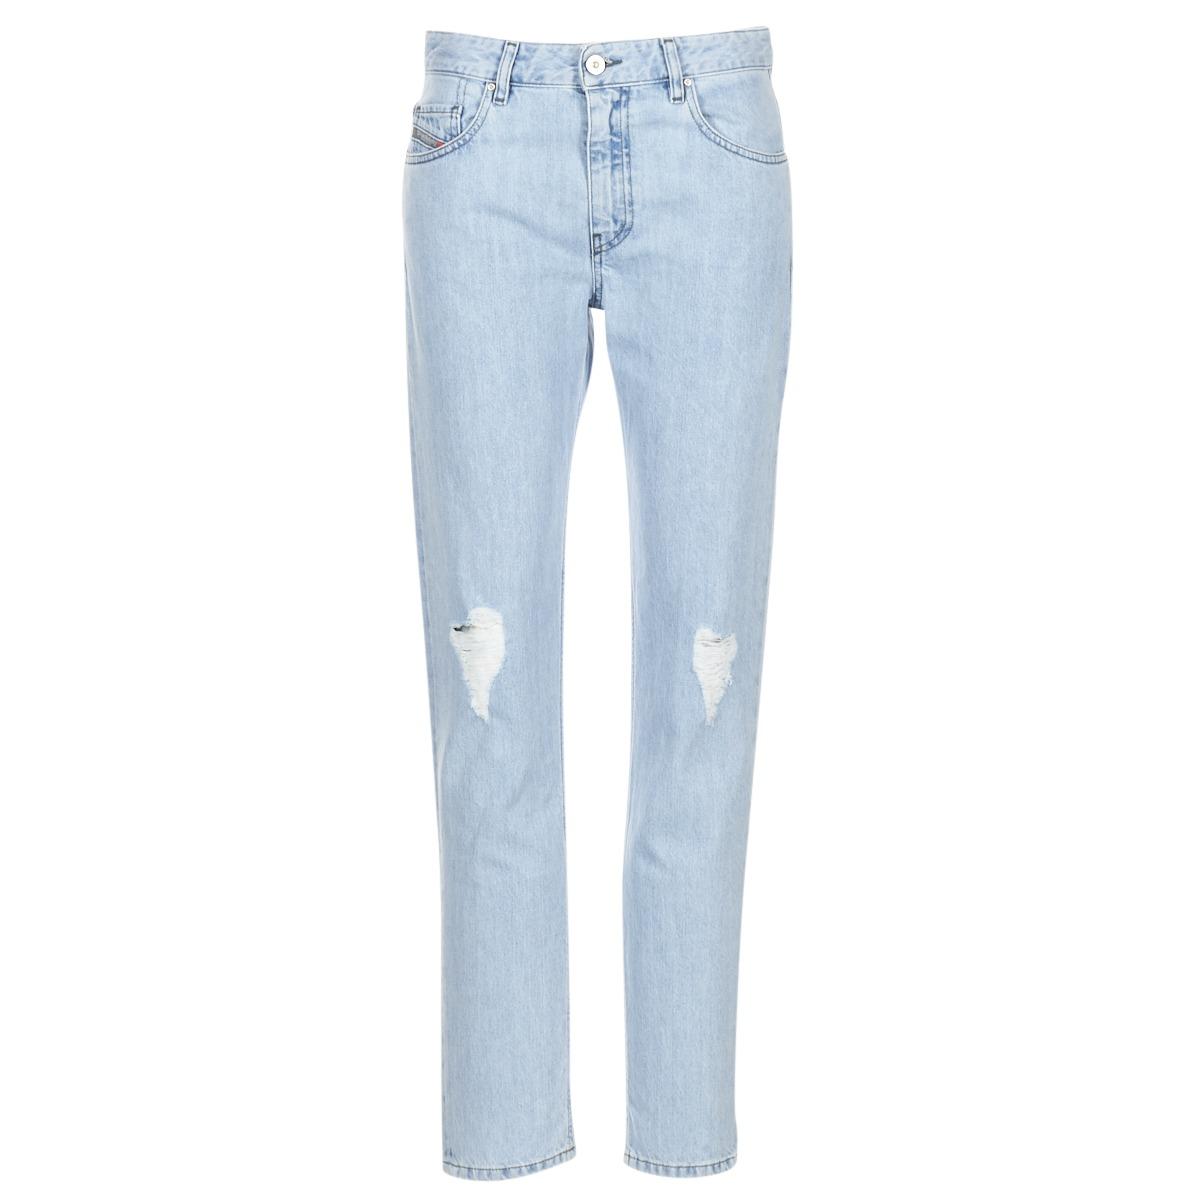 Lige jeans Diesel  NEEKHOL